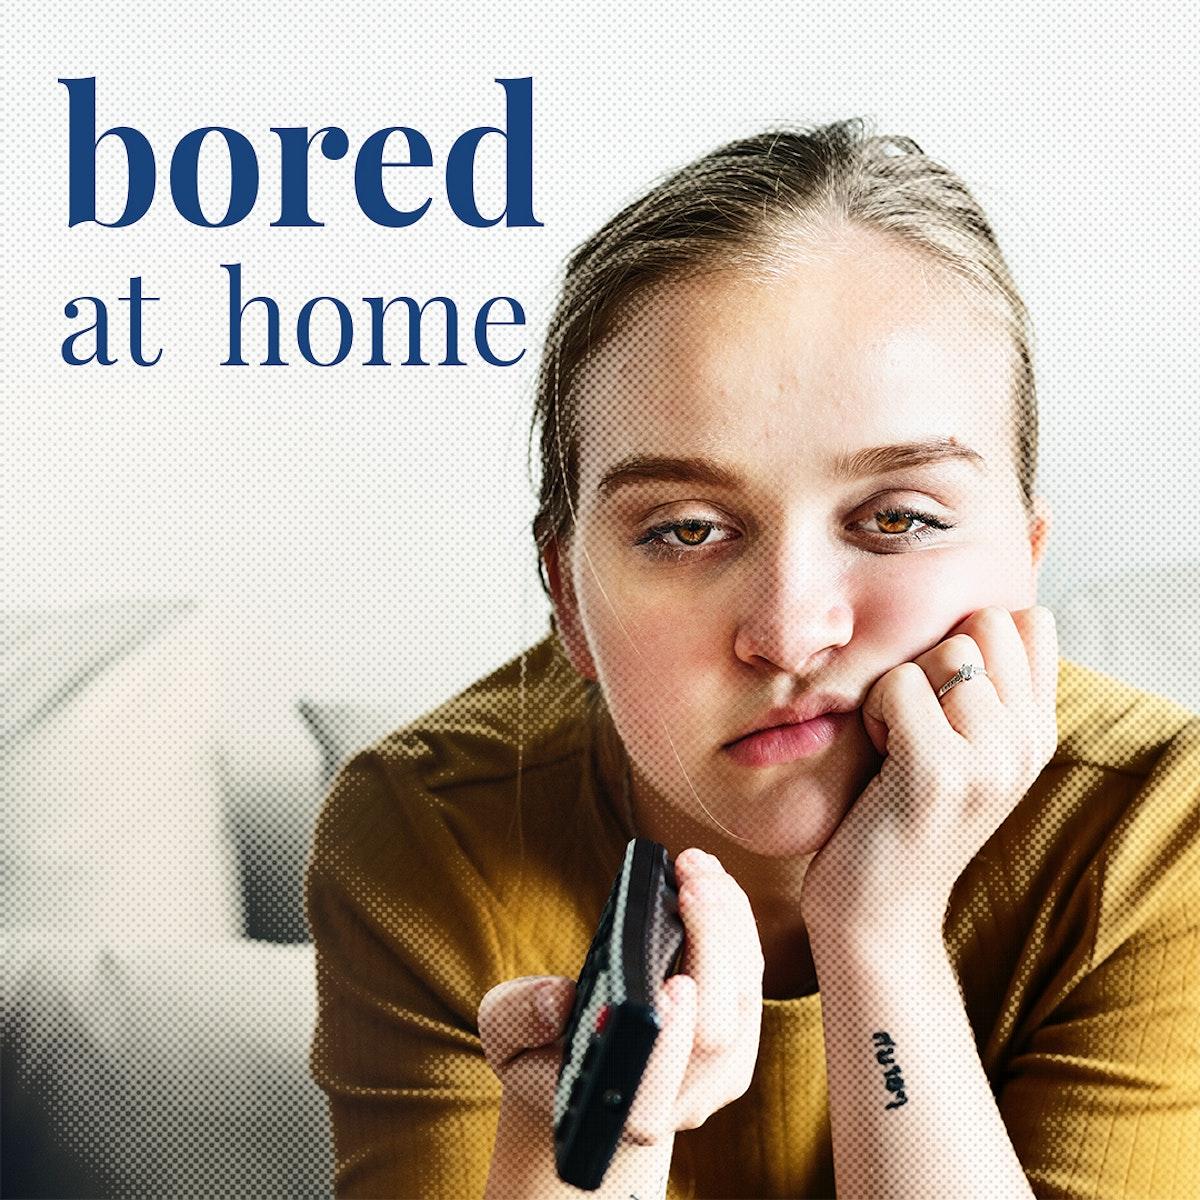 Young woman getting bored at home during coronavirus quarantine template mockup